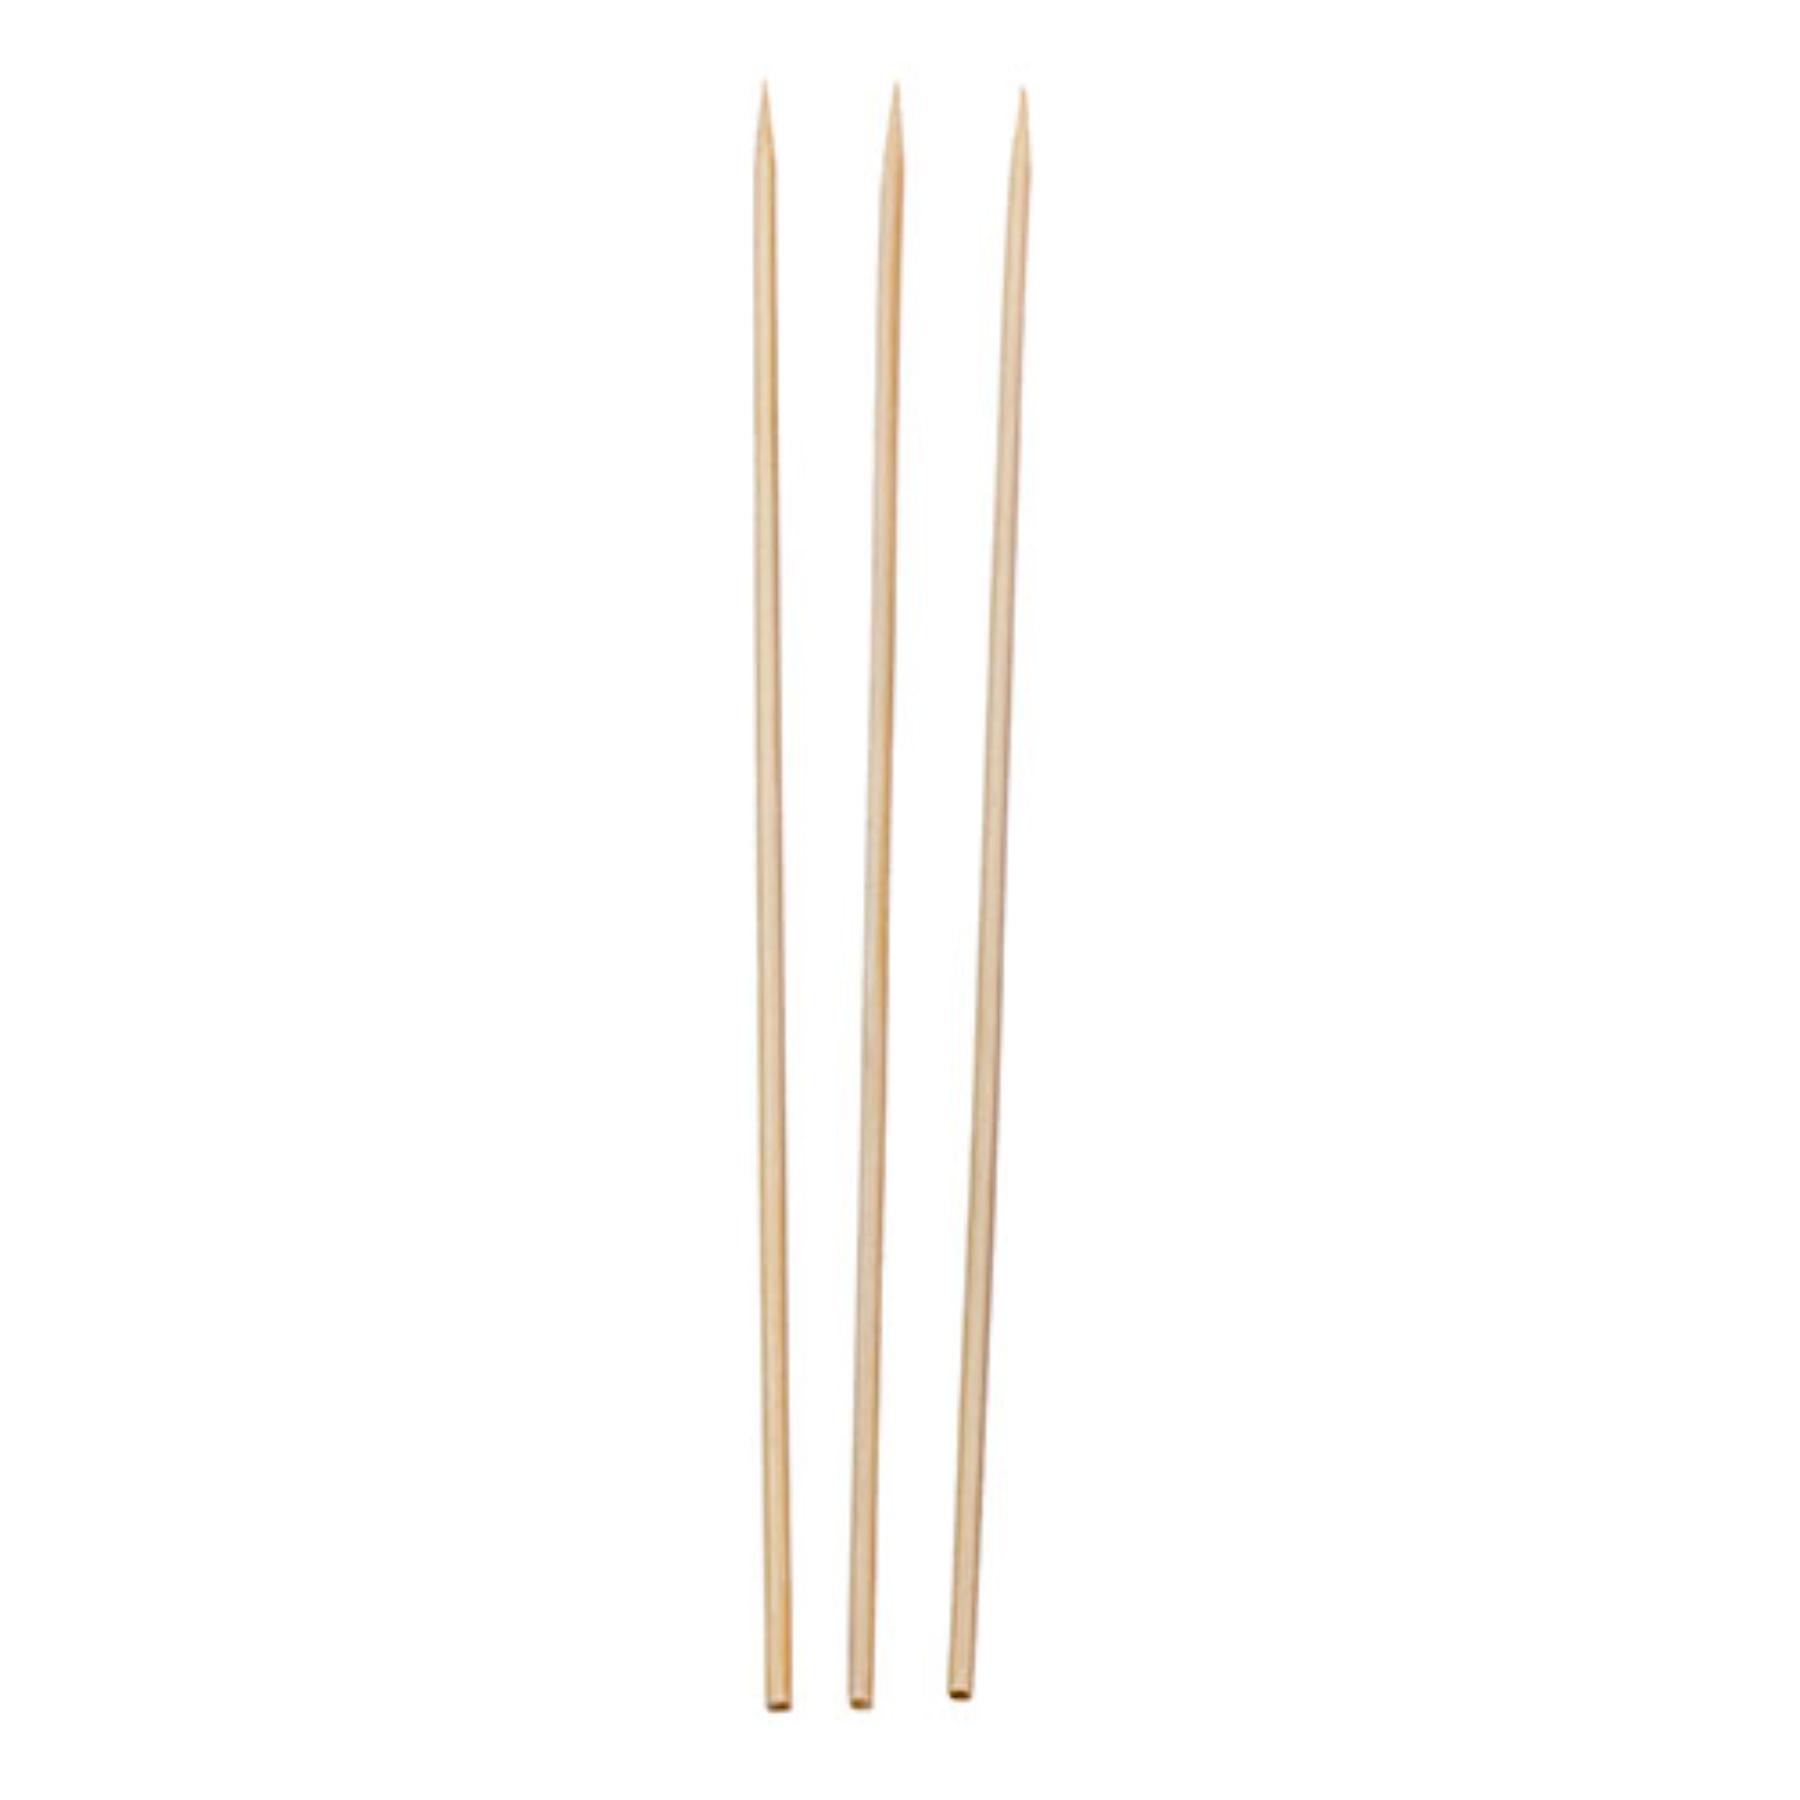 "Bamboo Skewers, 10"", 100/Pack, 10 Packs/Box"